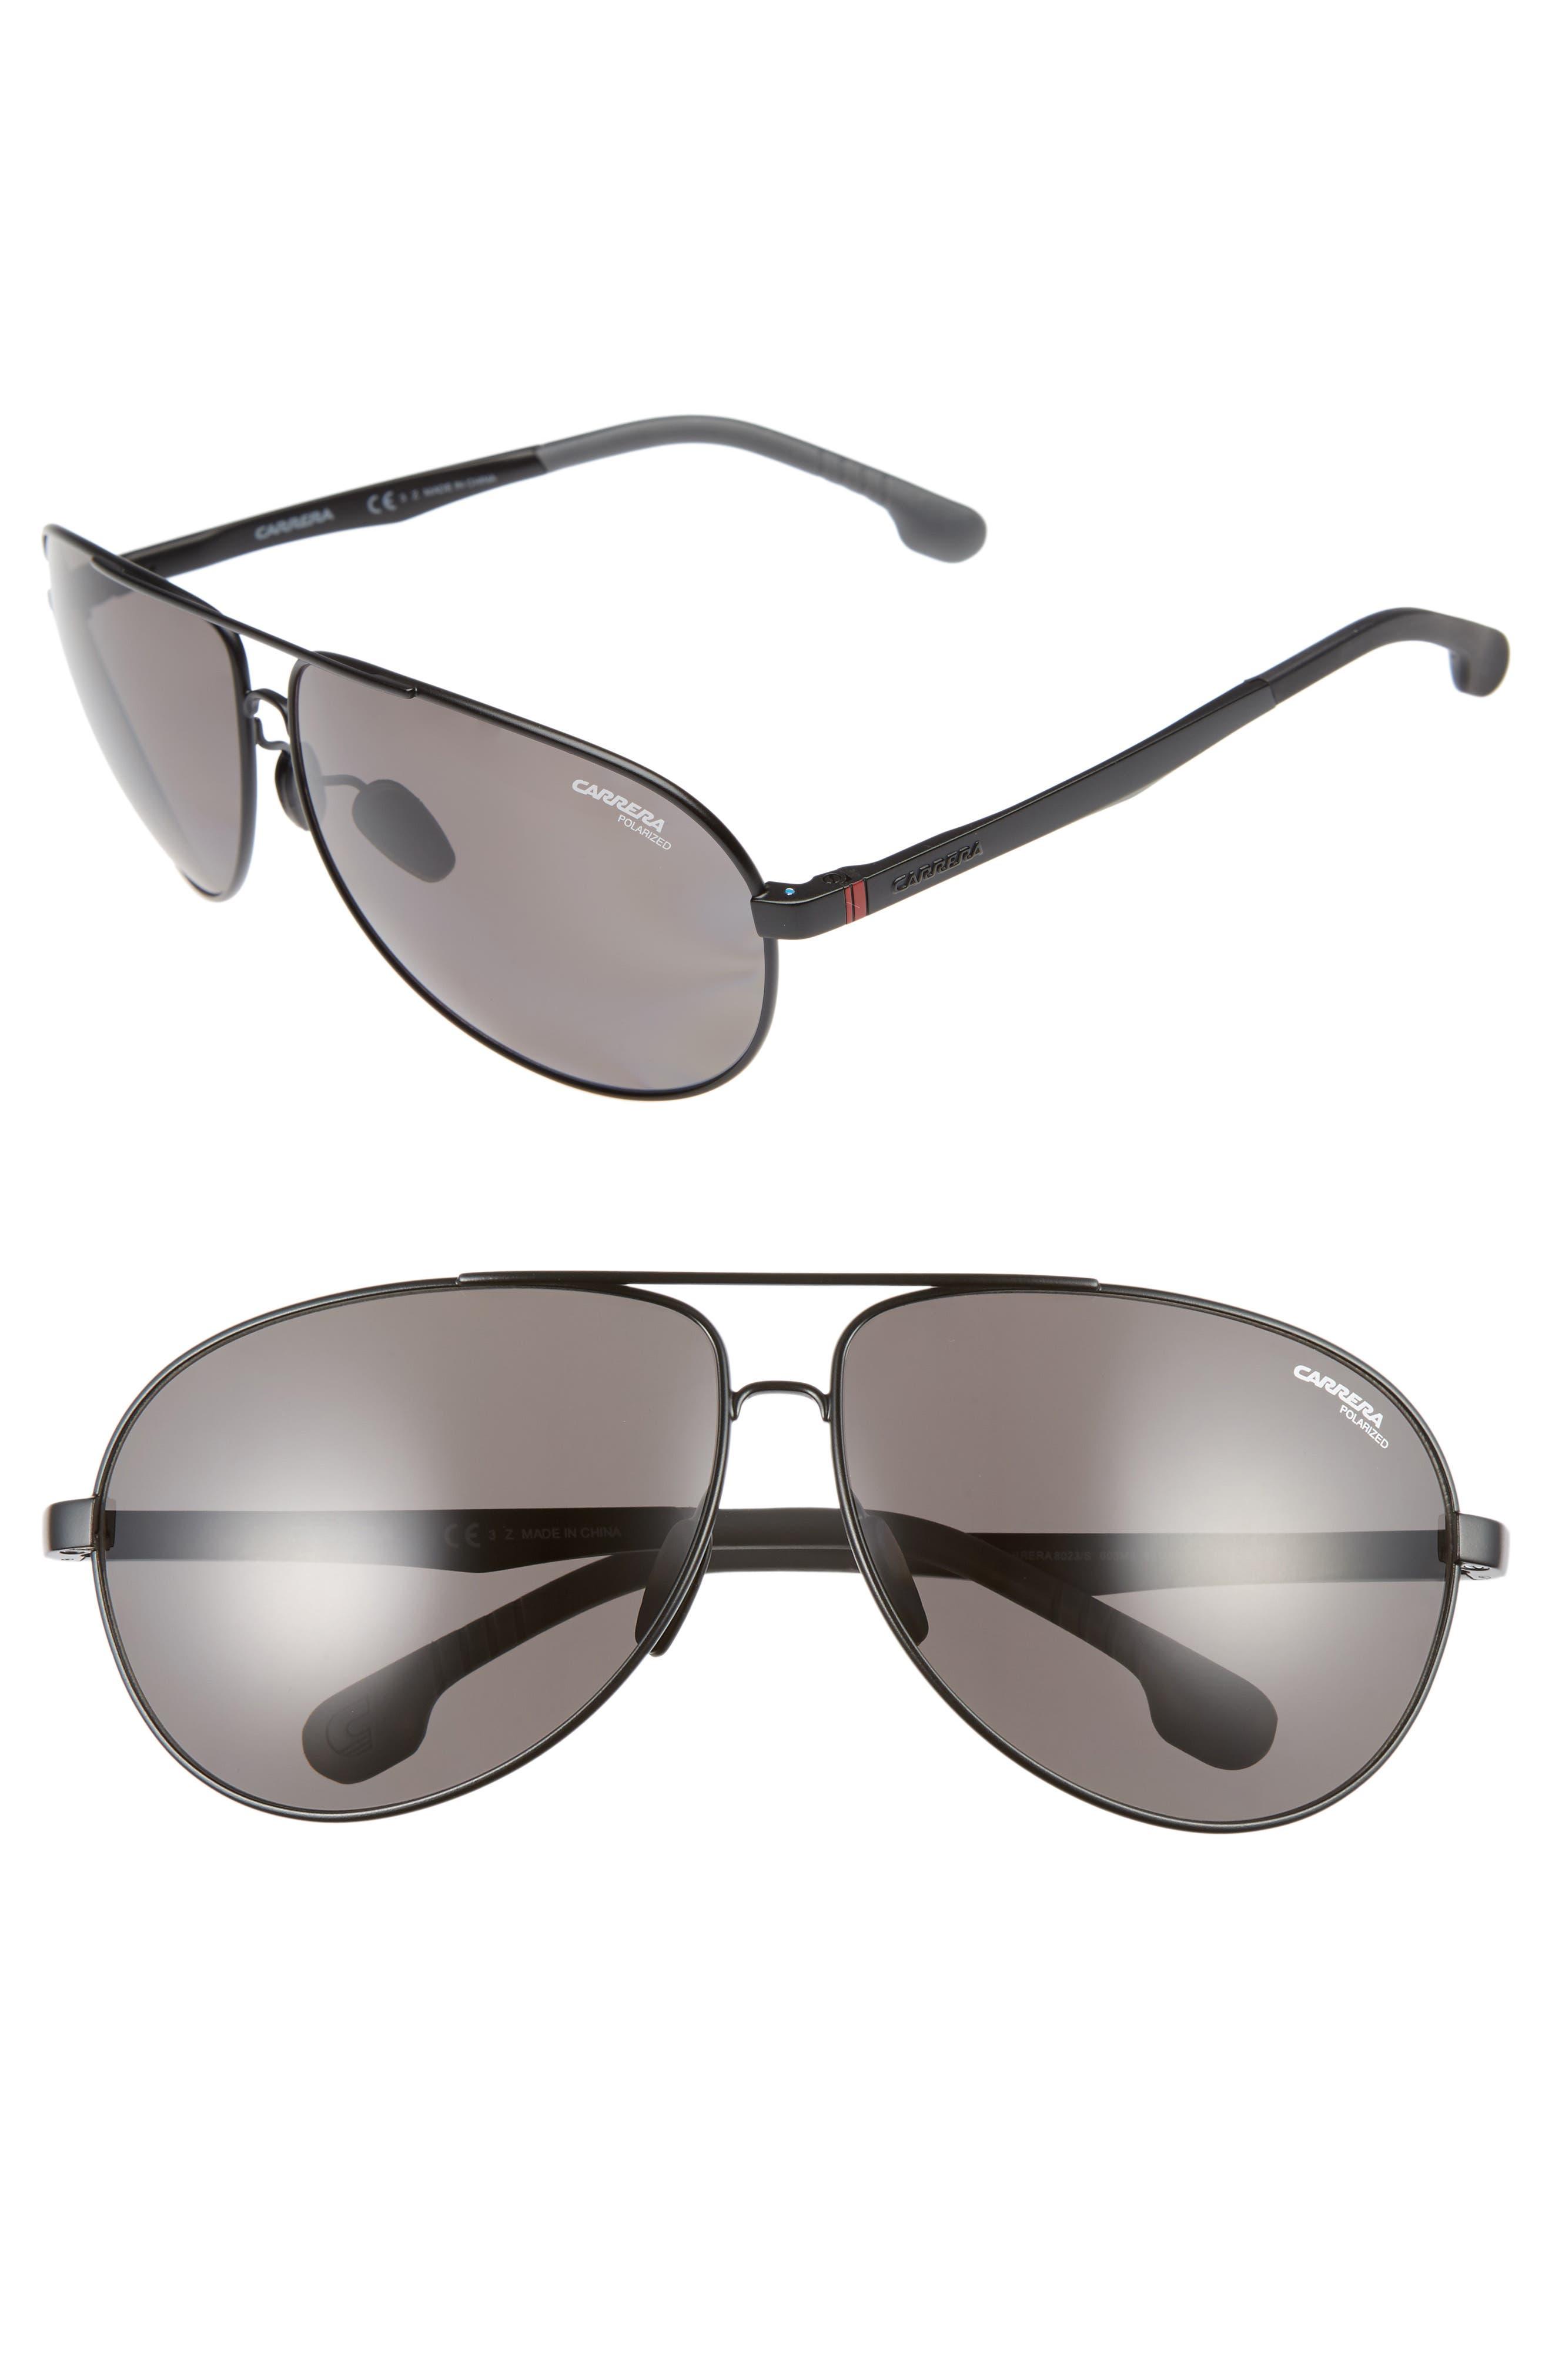 Carrera Eyewear 66mm Polarized Sunglasses